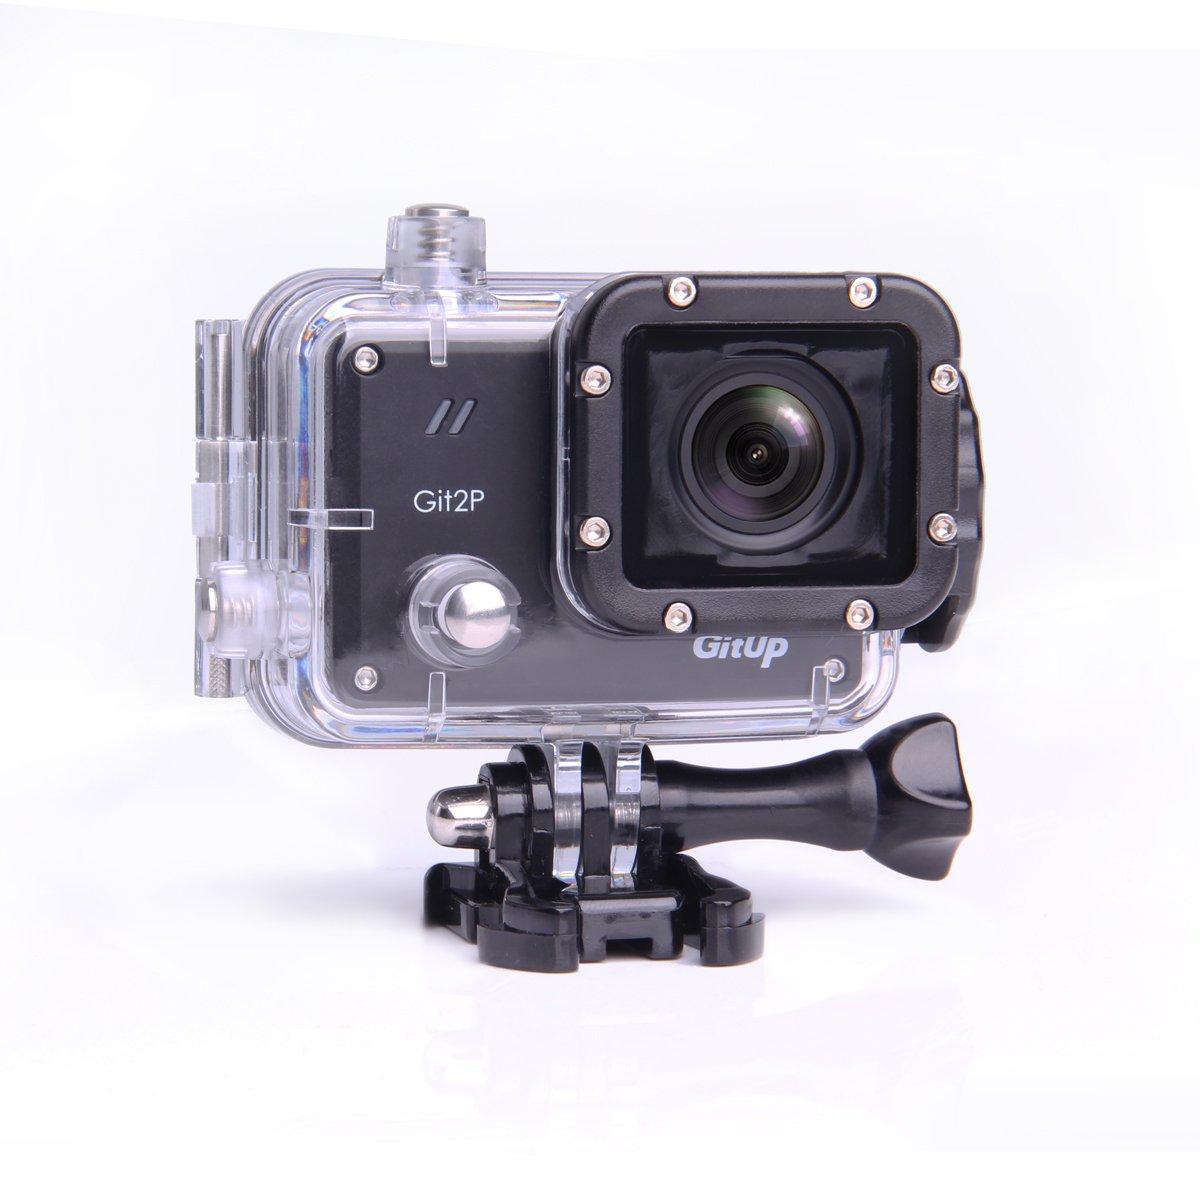 GitUp GIT2P Pro Sport Aktion Unterwasser-Kamera, Panasonic Sensor, 170 ° FOV WiFi Aktioncamera 30m wasserdichte Kamera DVR - Pro Edition 170 ° FOV WiFi Aktioncamera 30m wasserdichte Kamera DVR - Pro Edition (170 ° Grad Lens) RtTech - GitUp